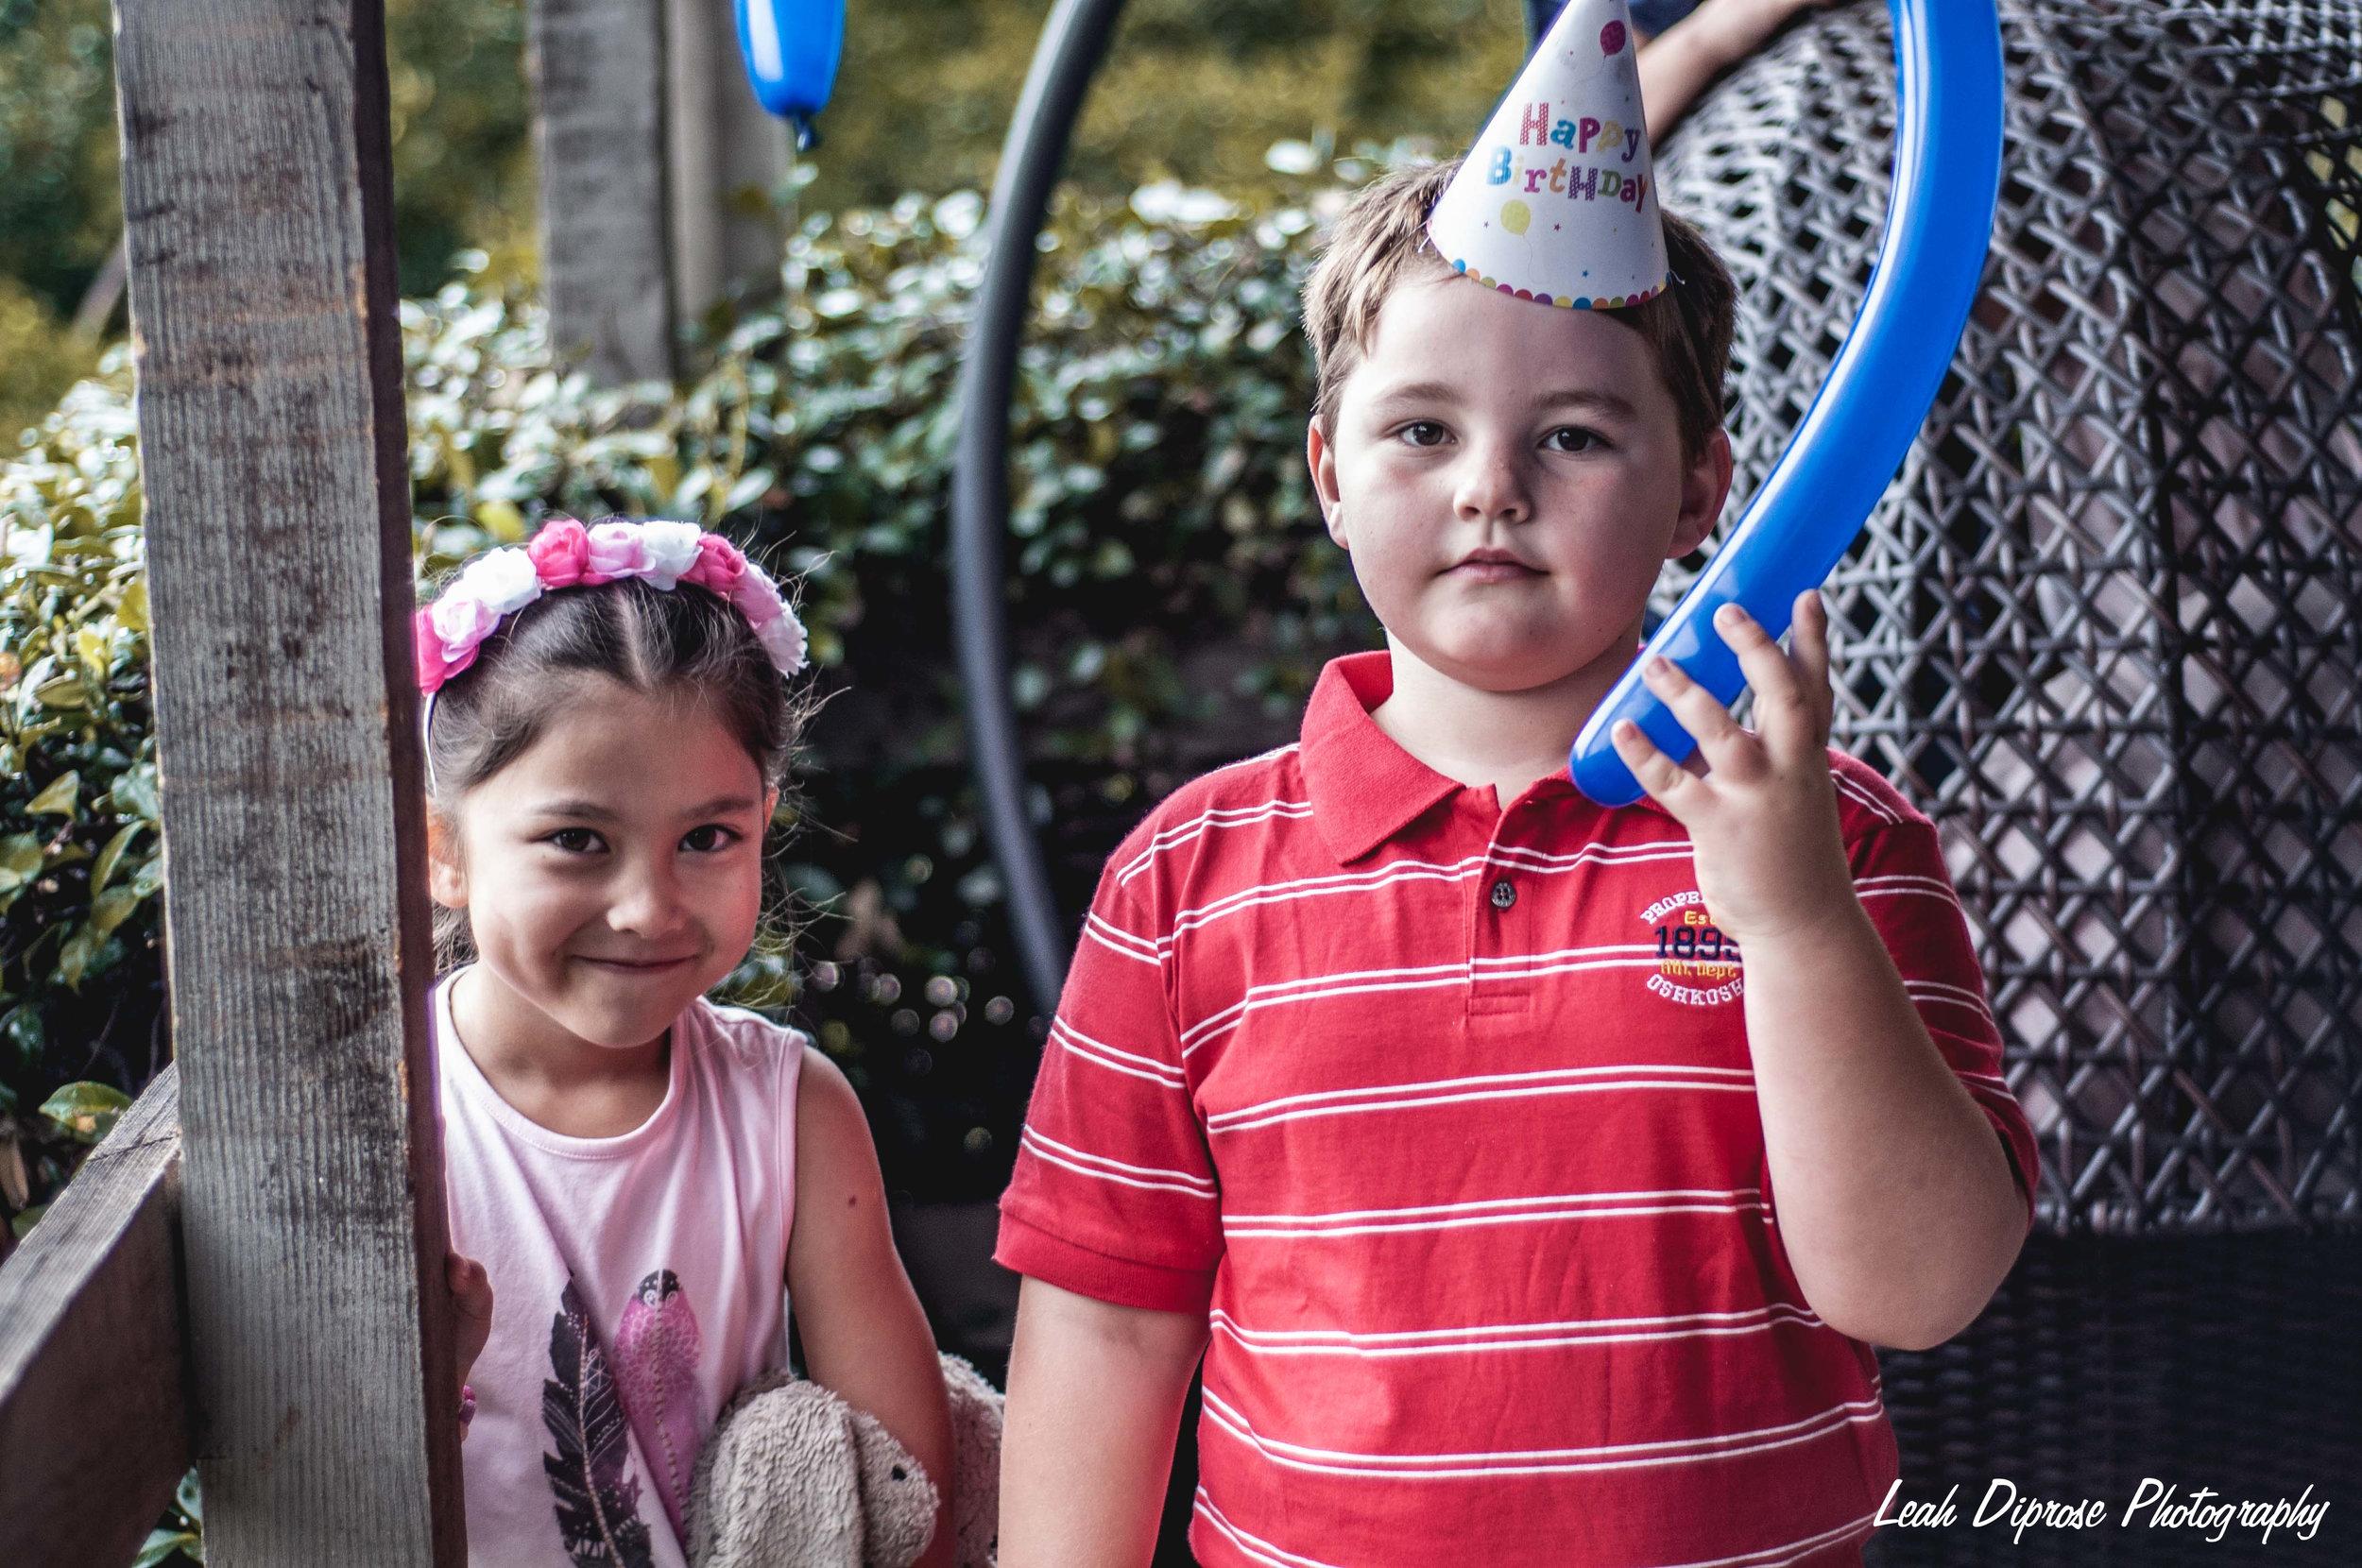 Leah Diprose Photography image-6766.jpg